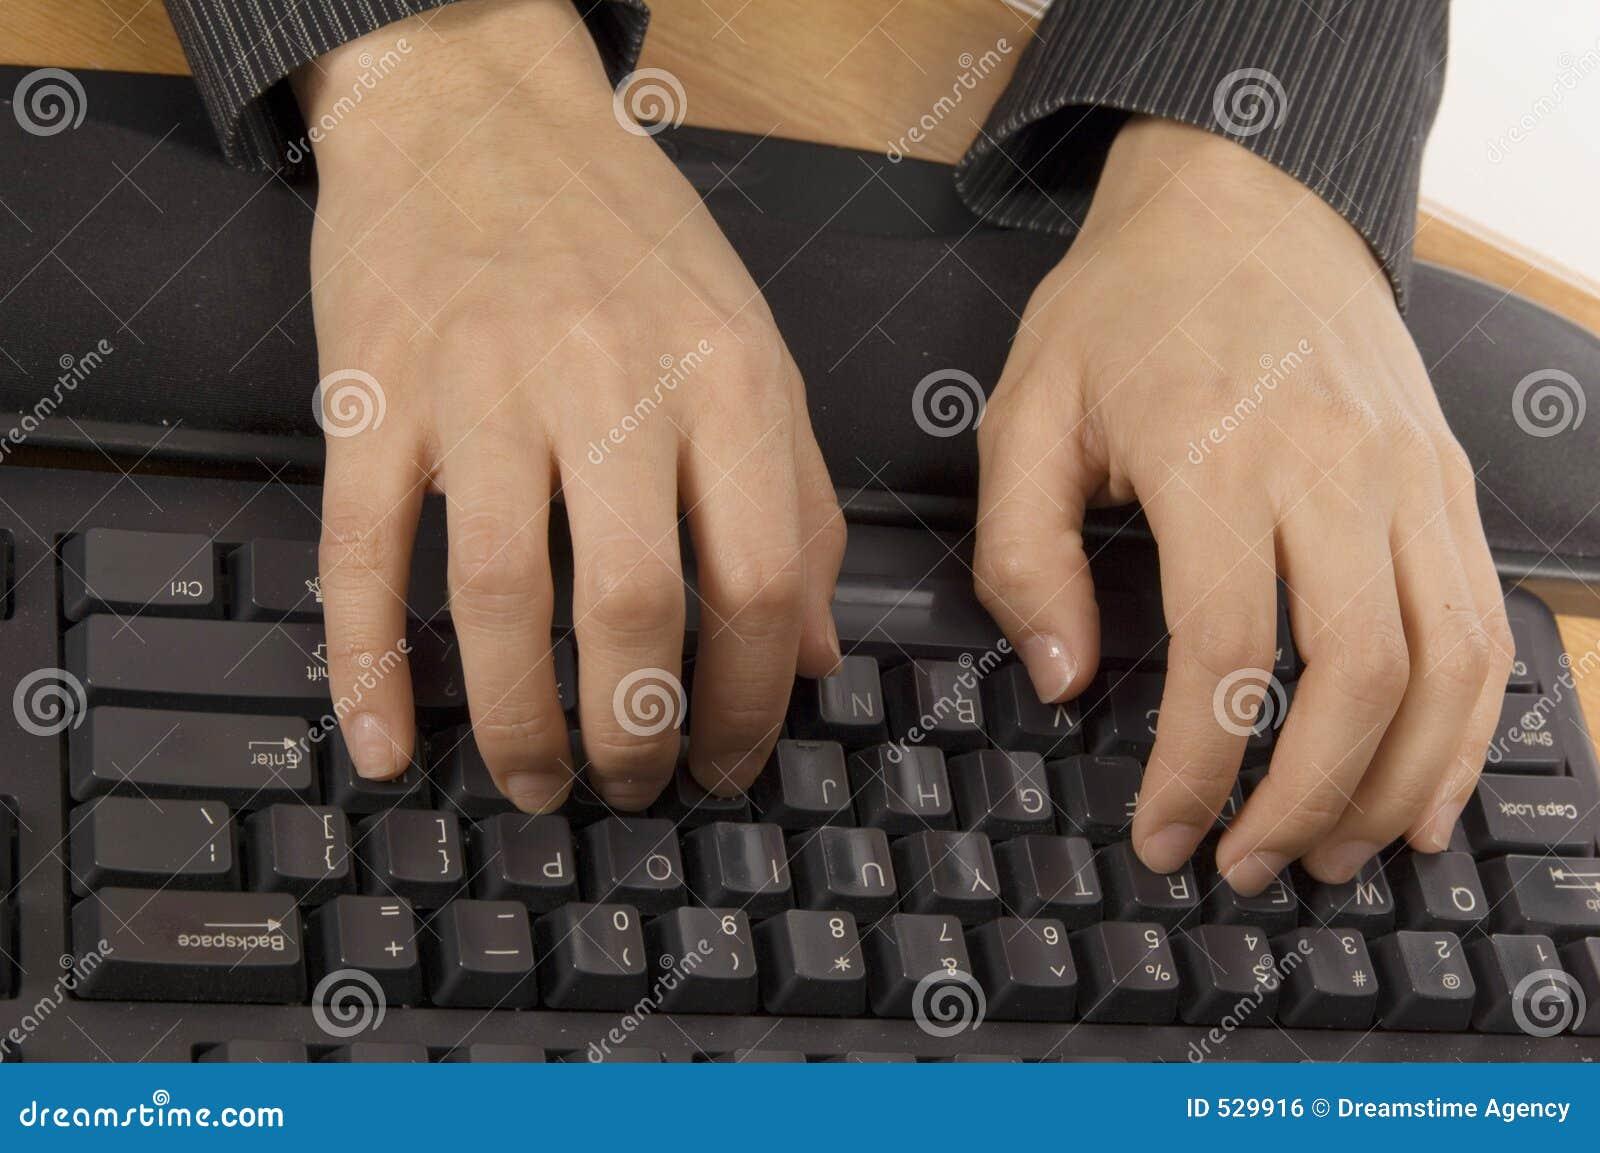 Download 关键董事会键入 库存照片. 图片 包括有 设备, 互联网, 办公室, 界面, 投反对票, 打字, 商业, 妇女 - 529916